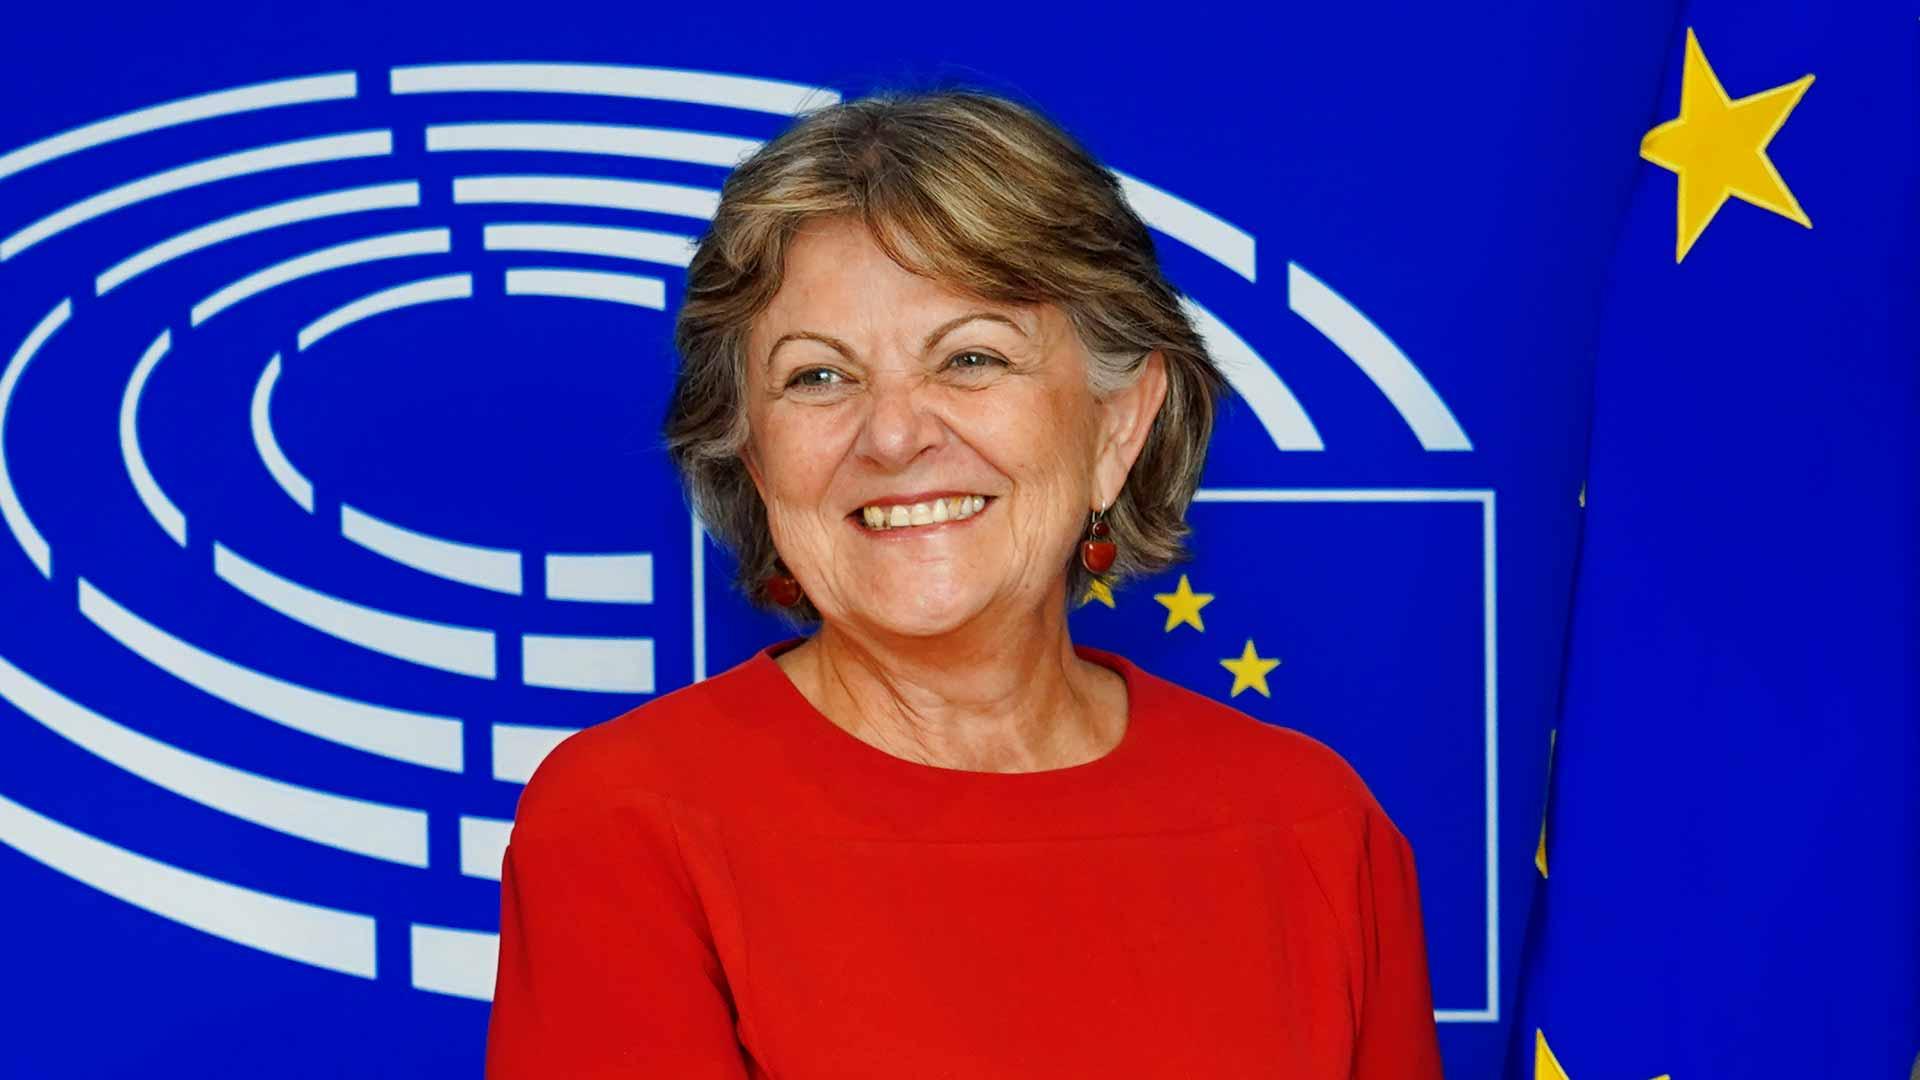 Elisa Ferreira Commissioner Cohesion and Reforms